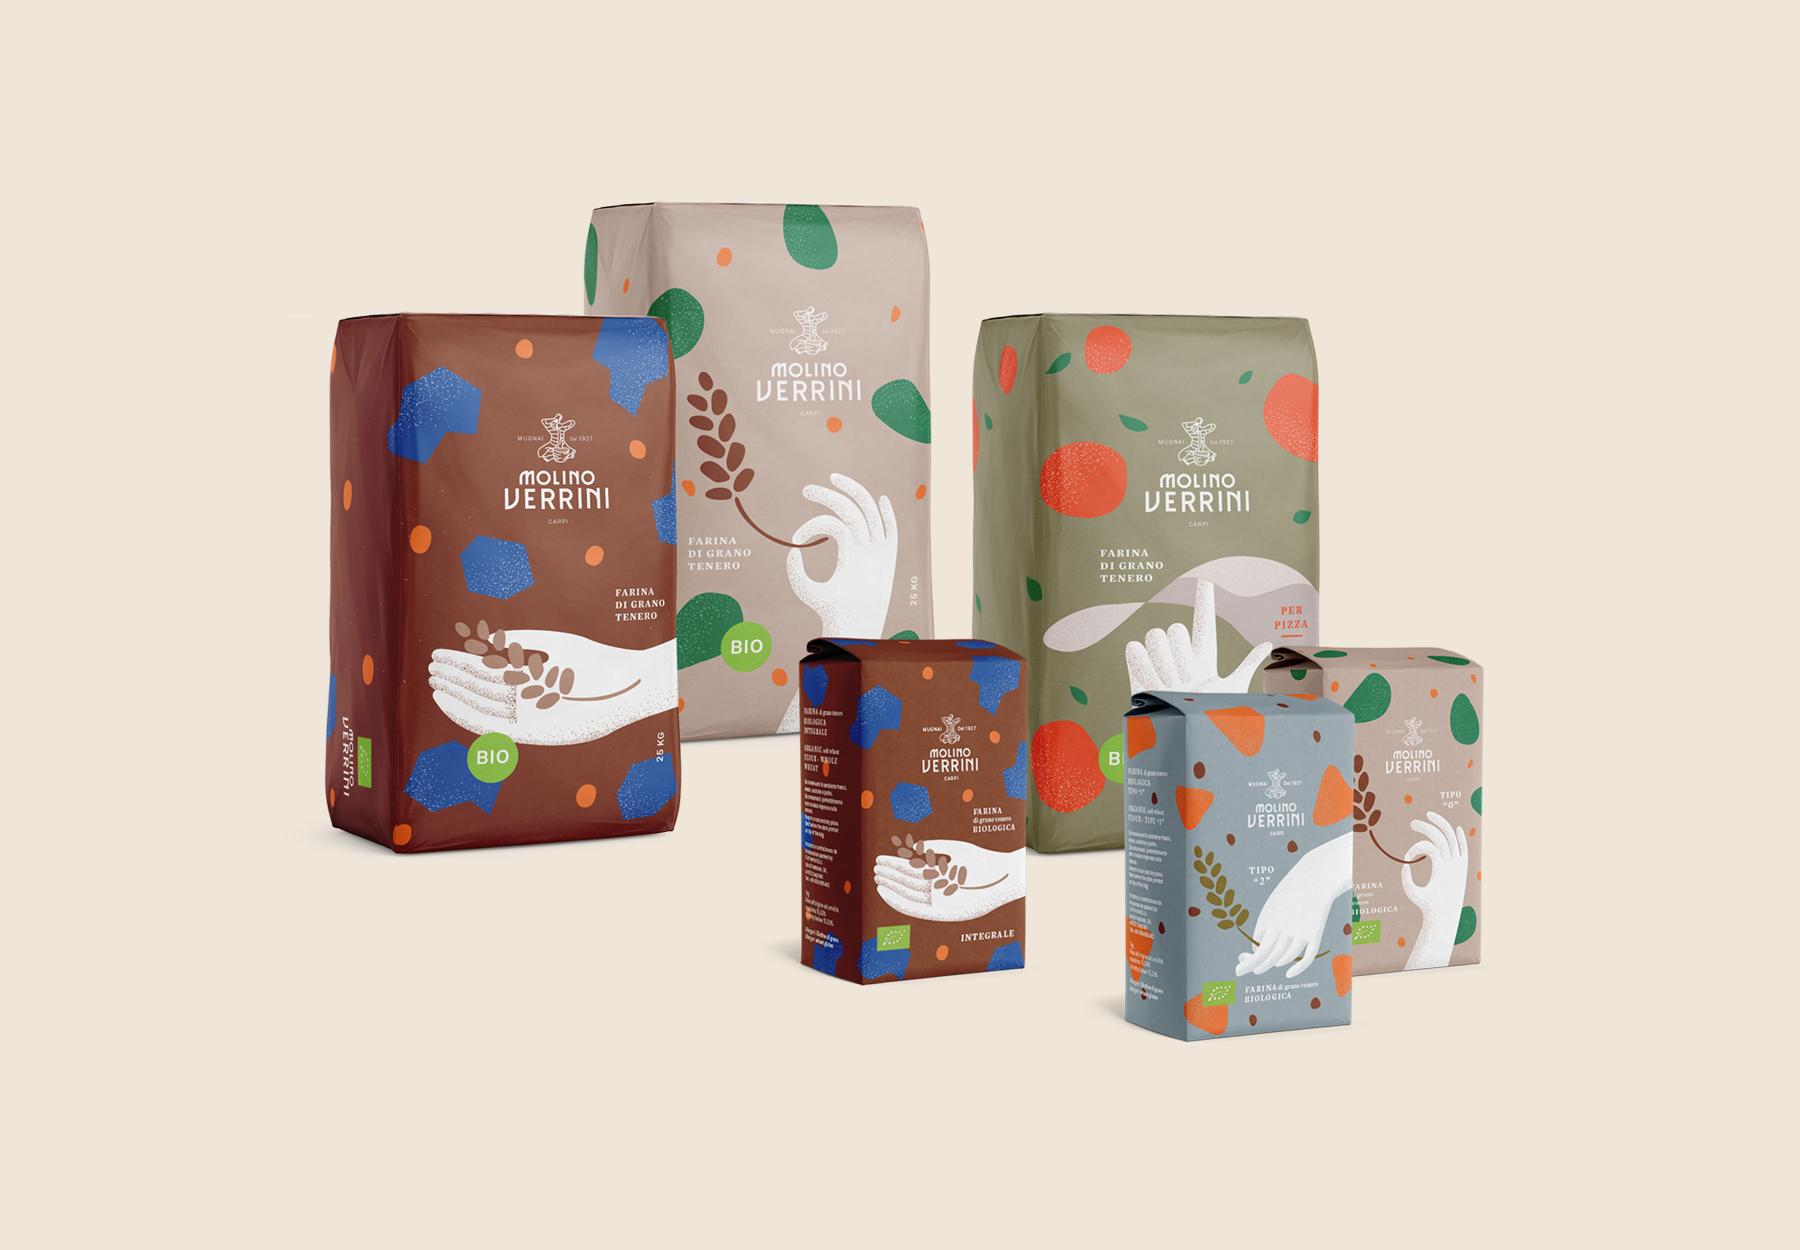 Packaging Design for Molino Verrini Organic Flous by Dry Studio